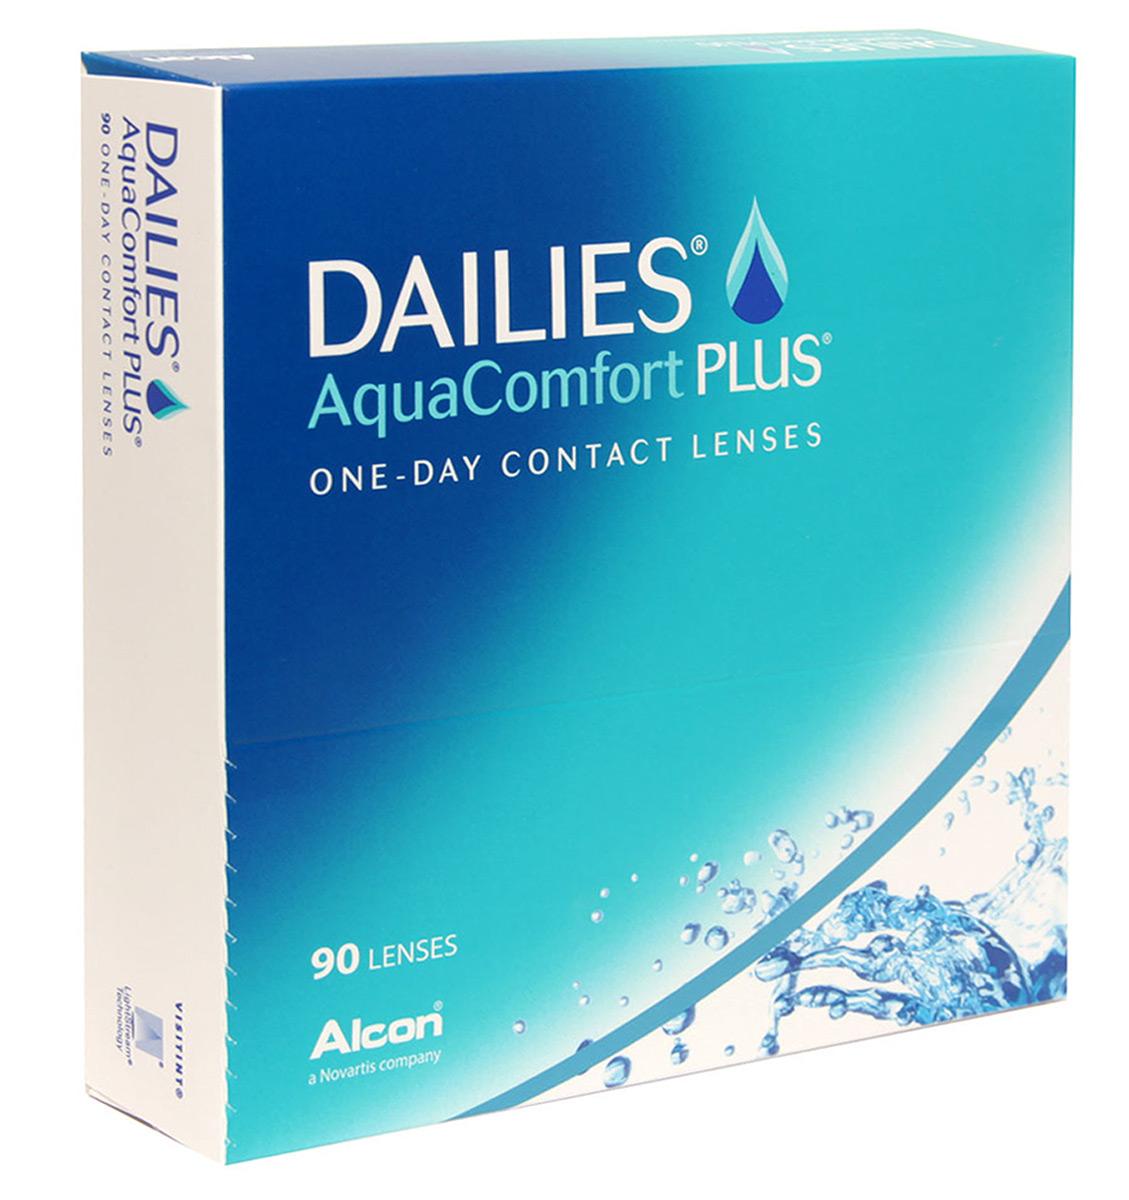 Alcon-CIBA Vision контактные линзы Dailies AquaComfort Plus (90шт / 8.7 / 14.0 / +4.75)